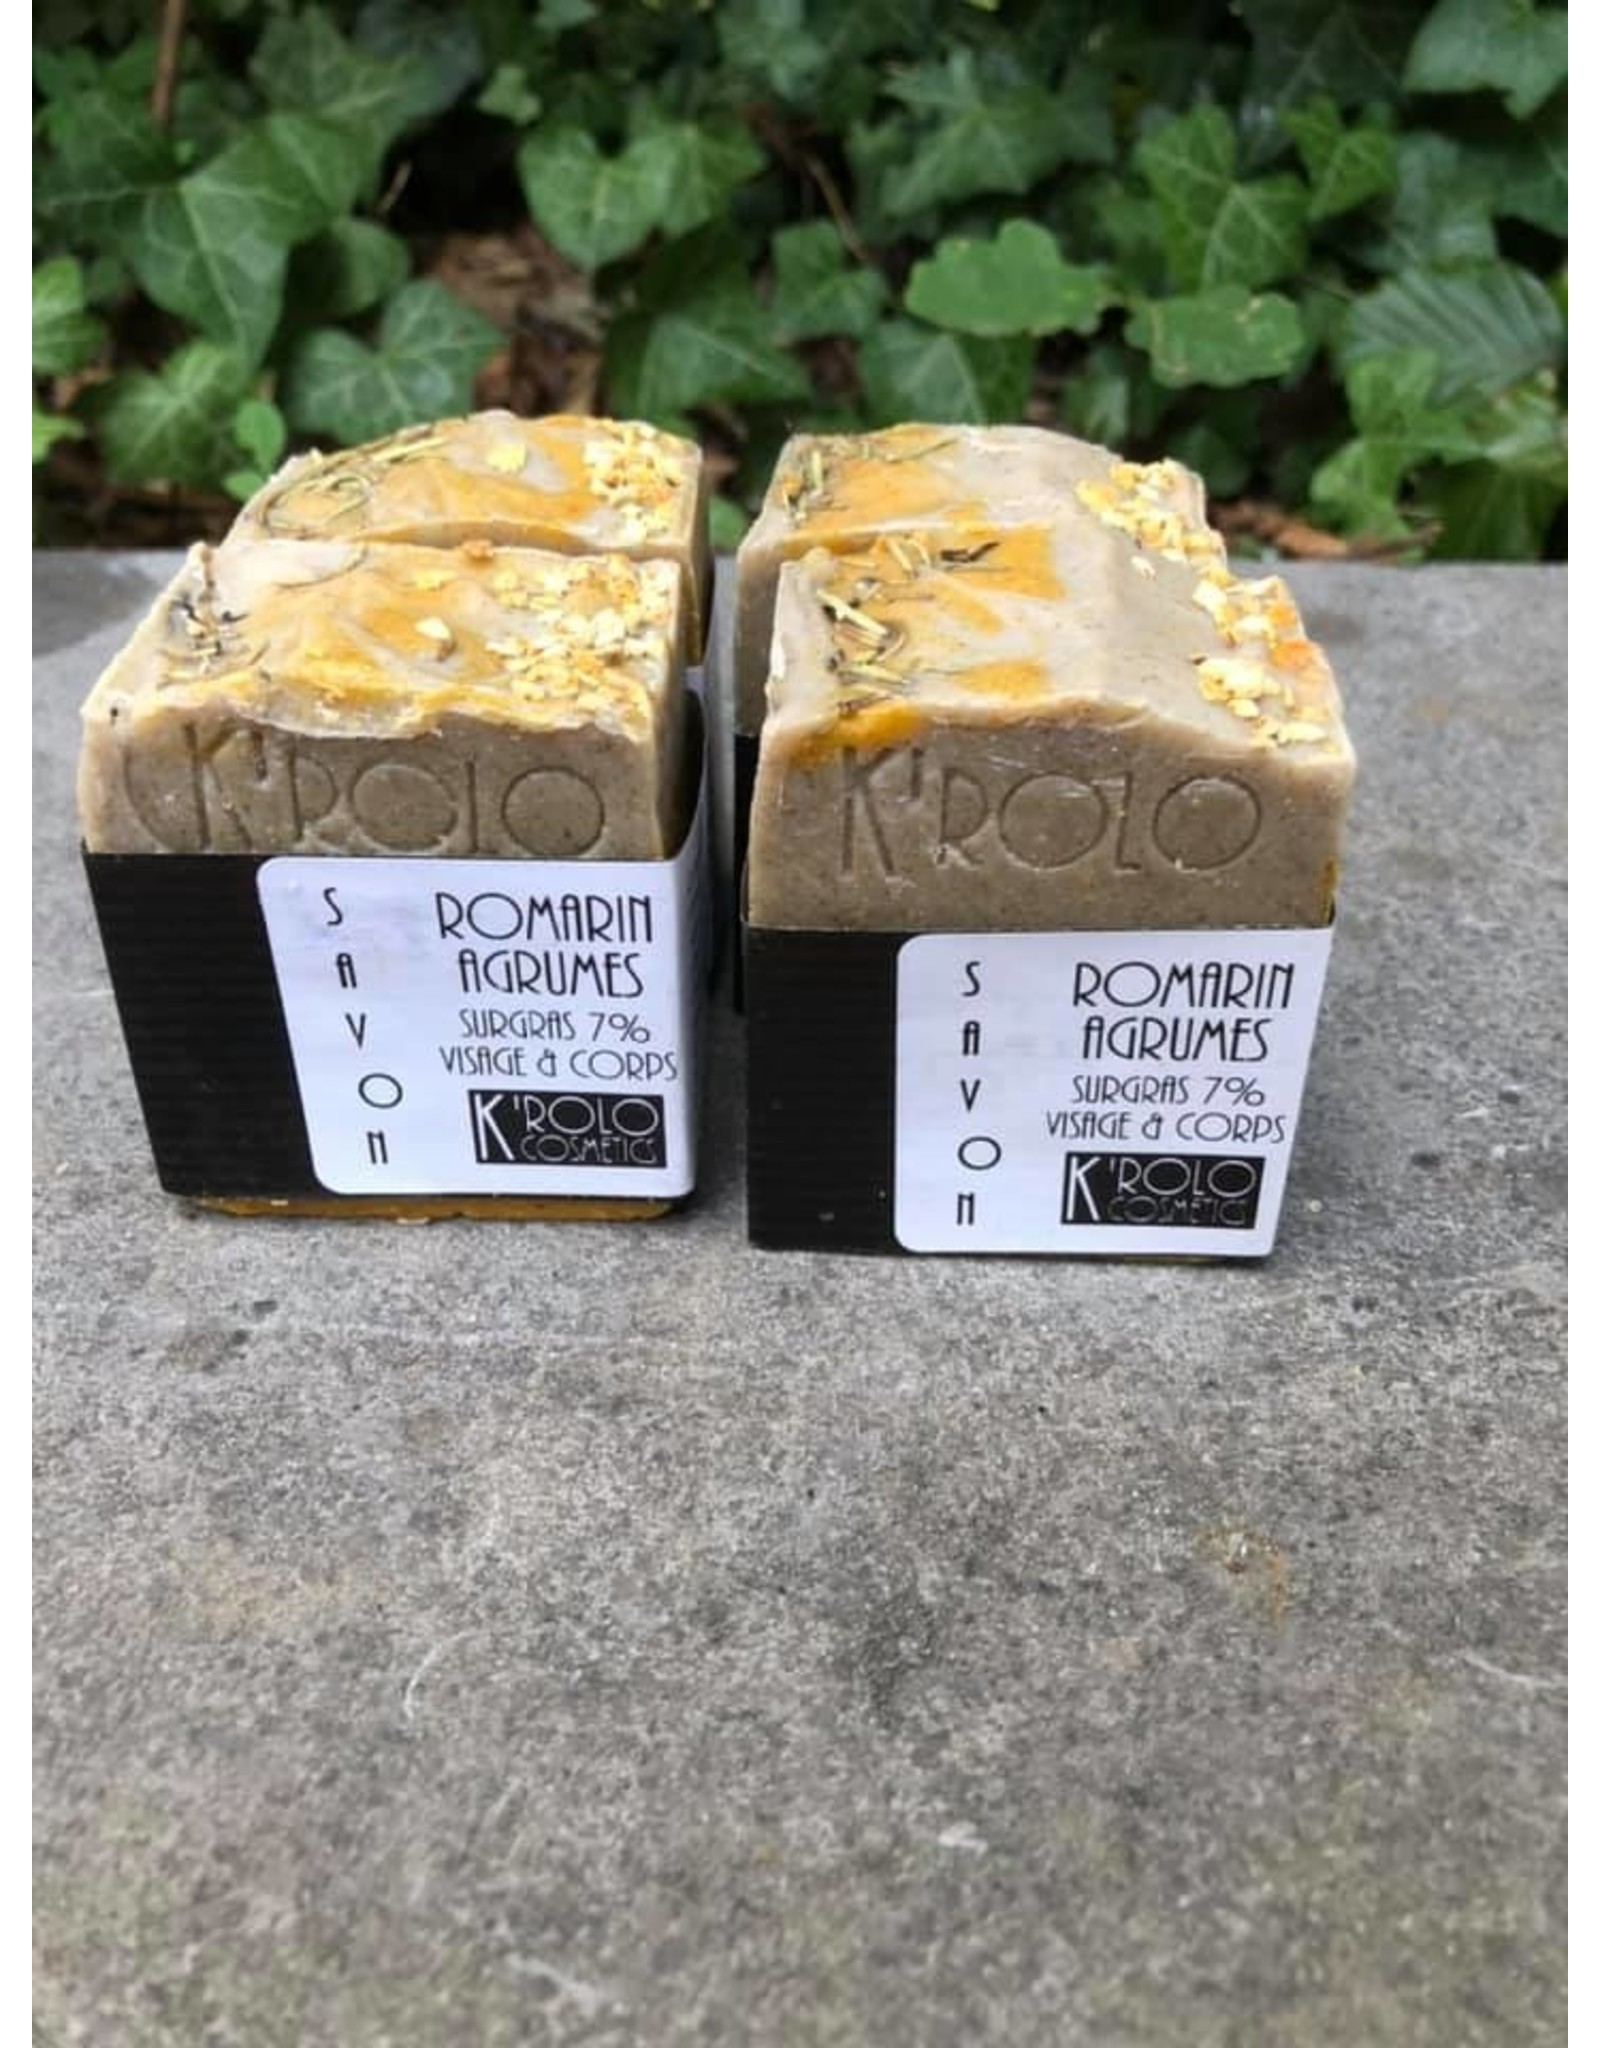 K'rolo Cosmetics savon romarin-agrumes